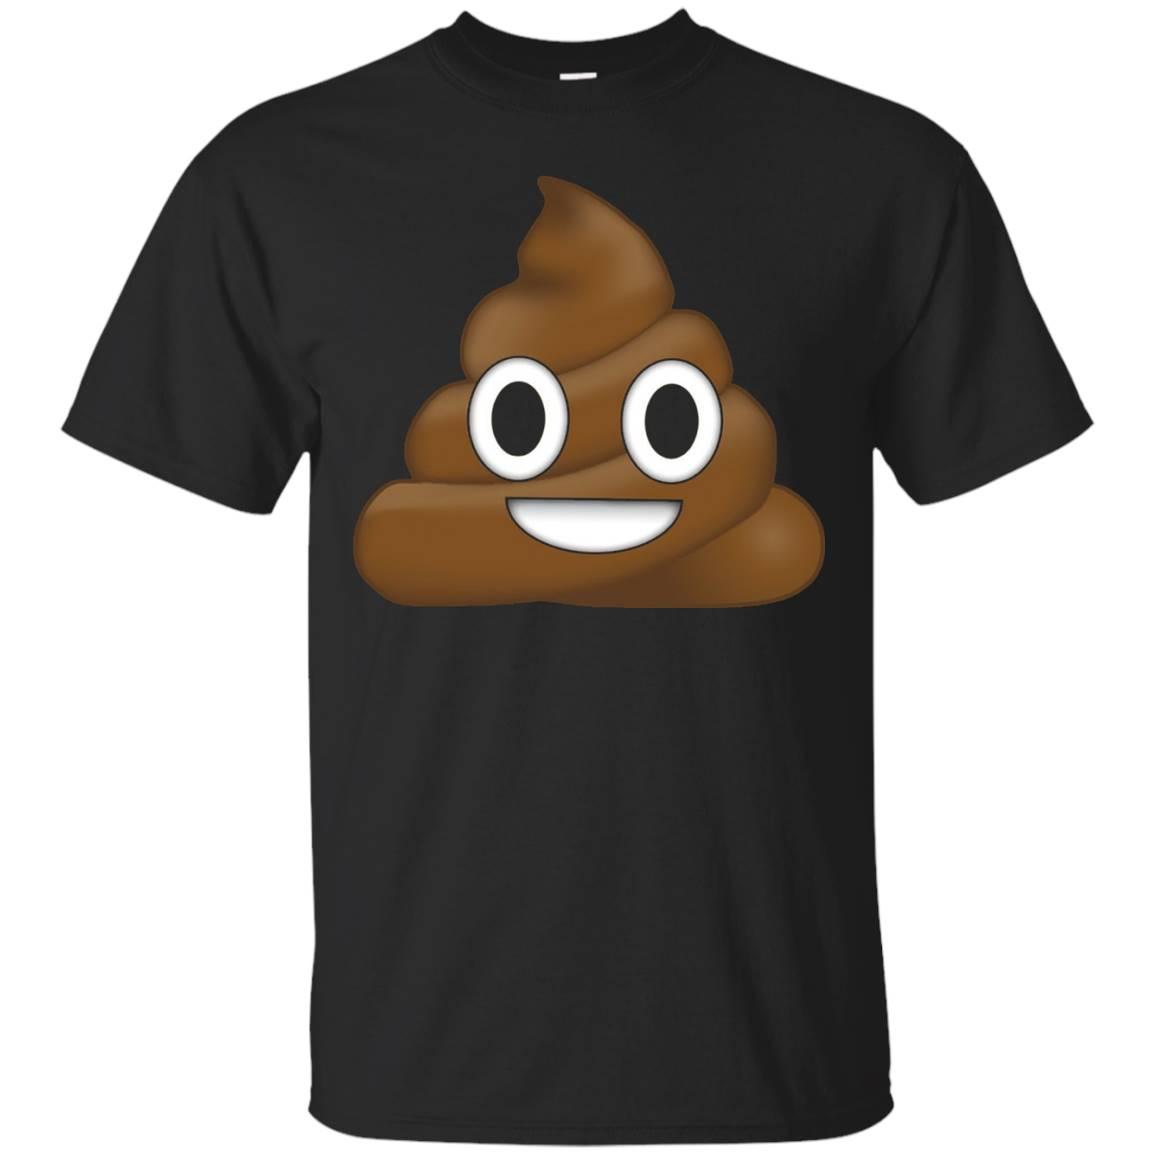 Poop Emoji Shit Emoticon T-Shirt